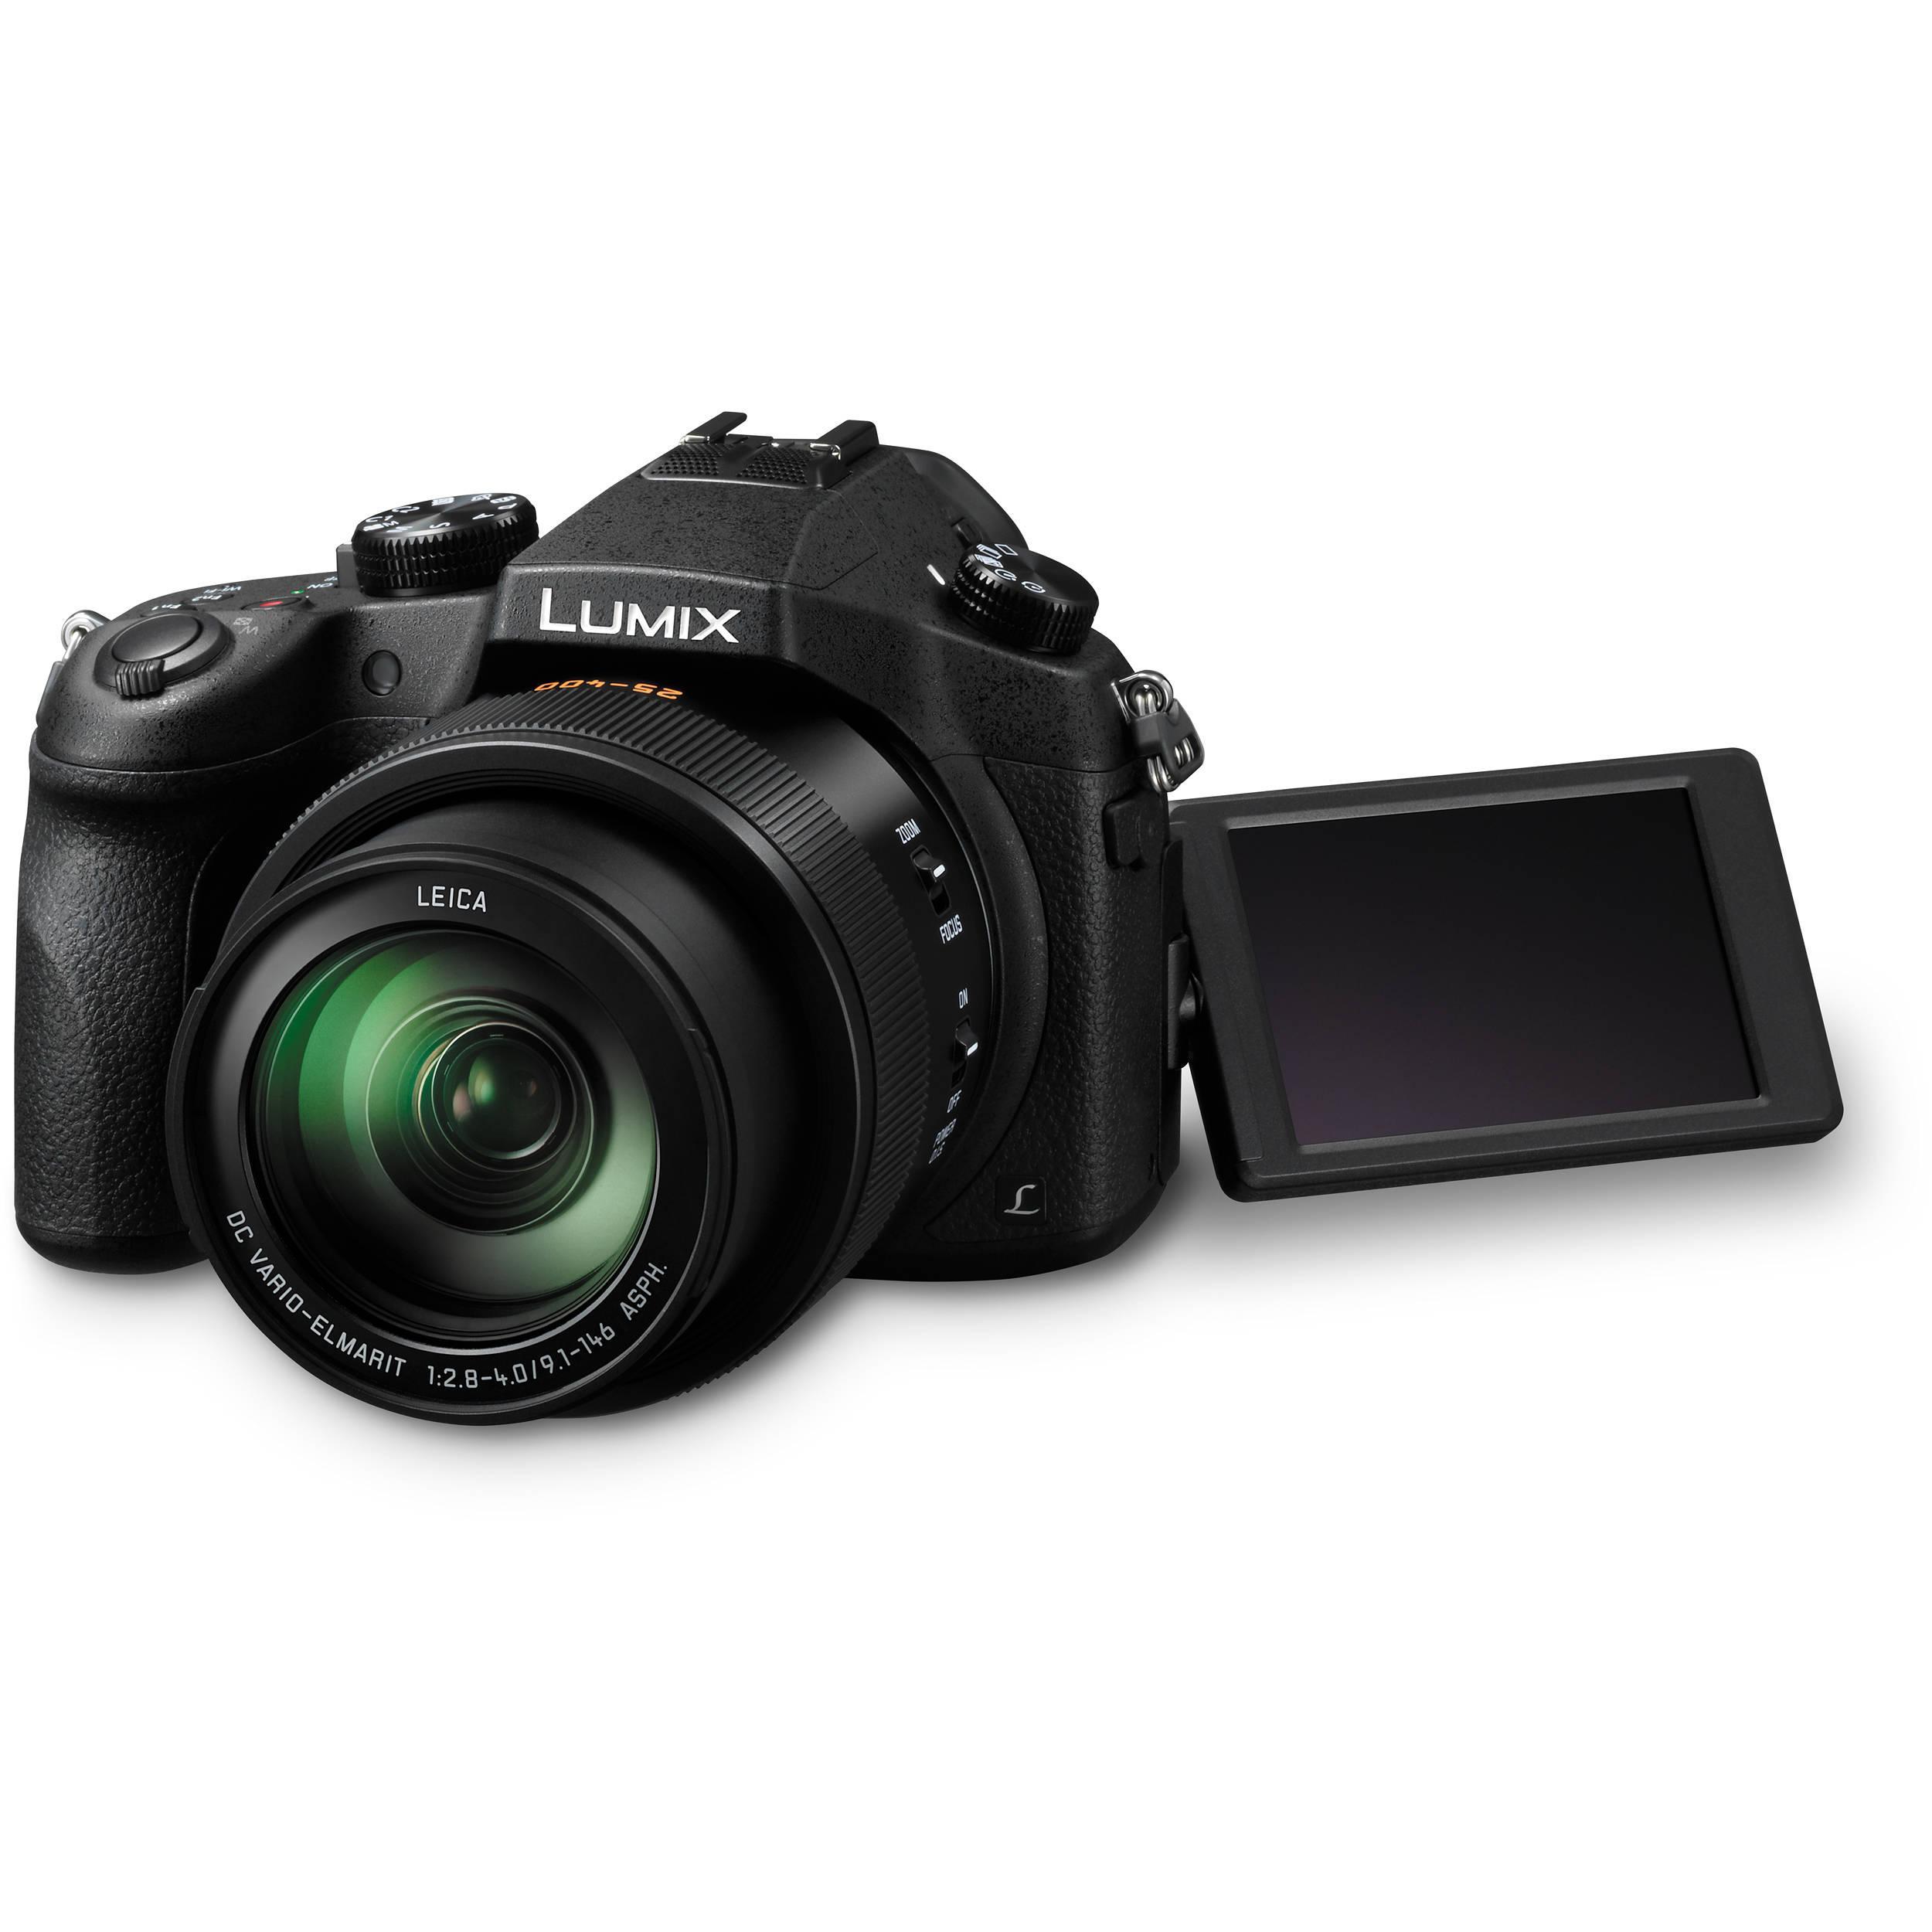 Panasonic Lumix DMC-FZ1000 Bridge 20 - Black